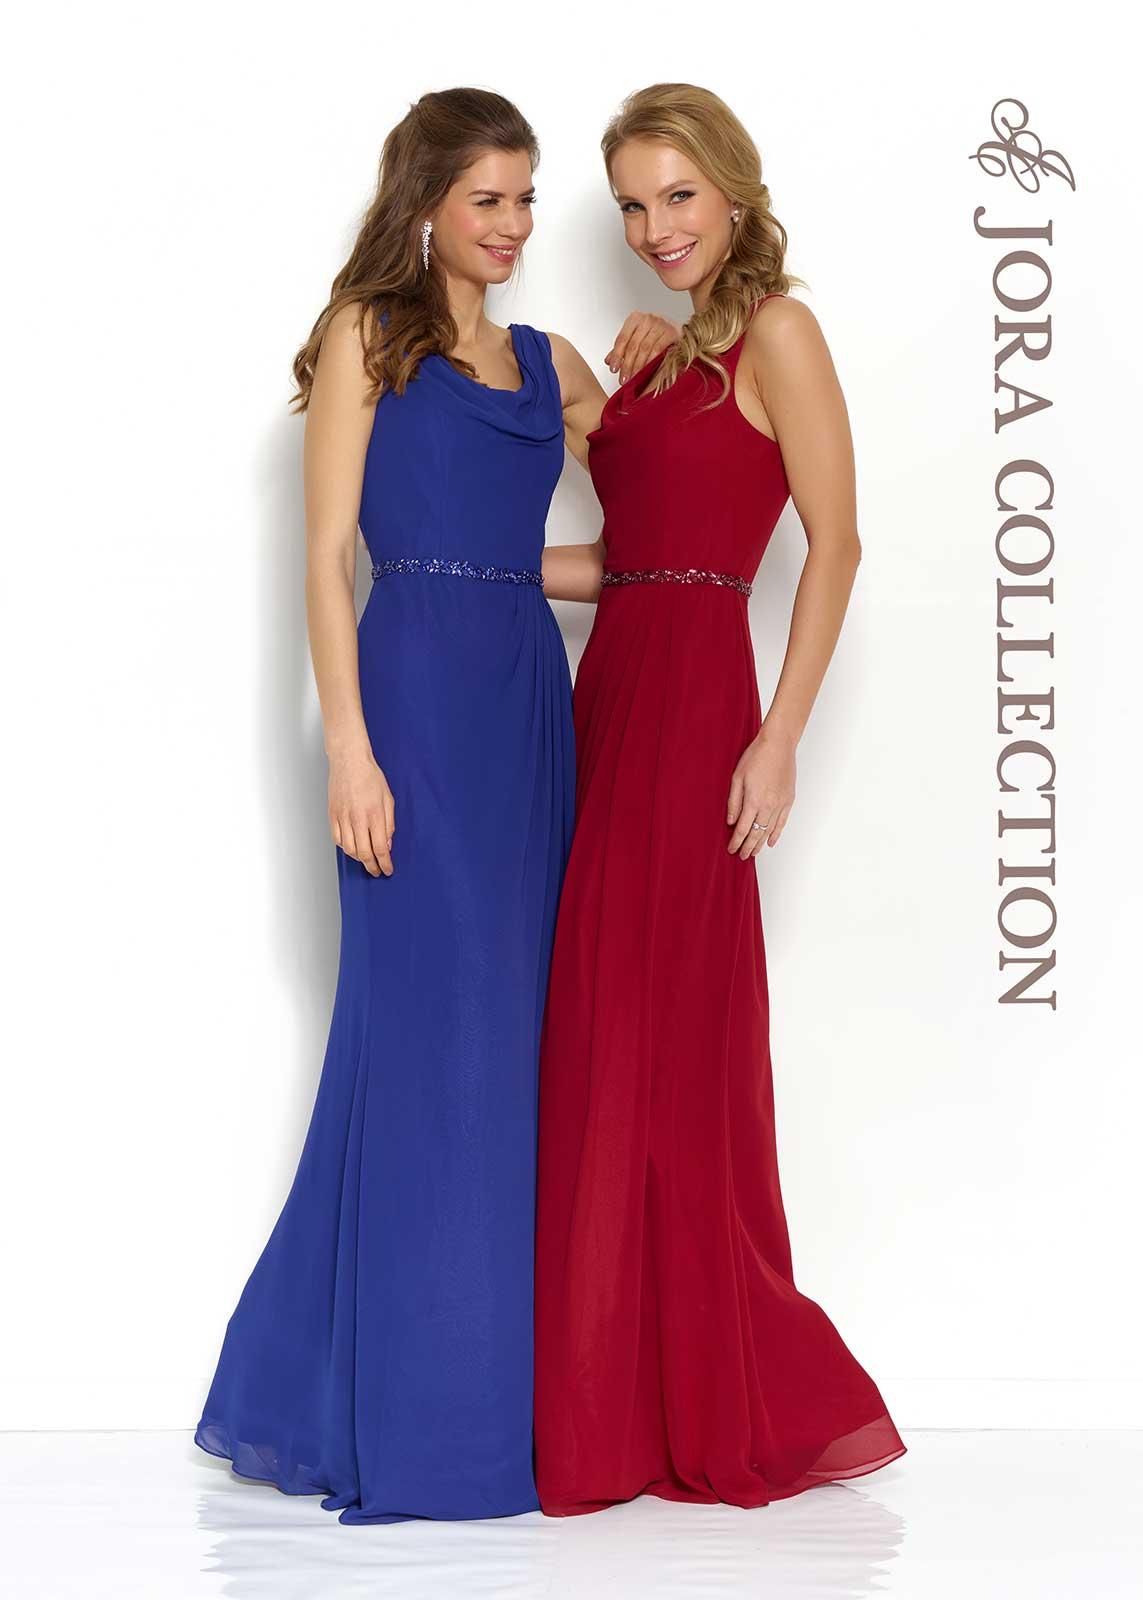 63683 prom dress